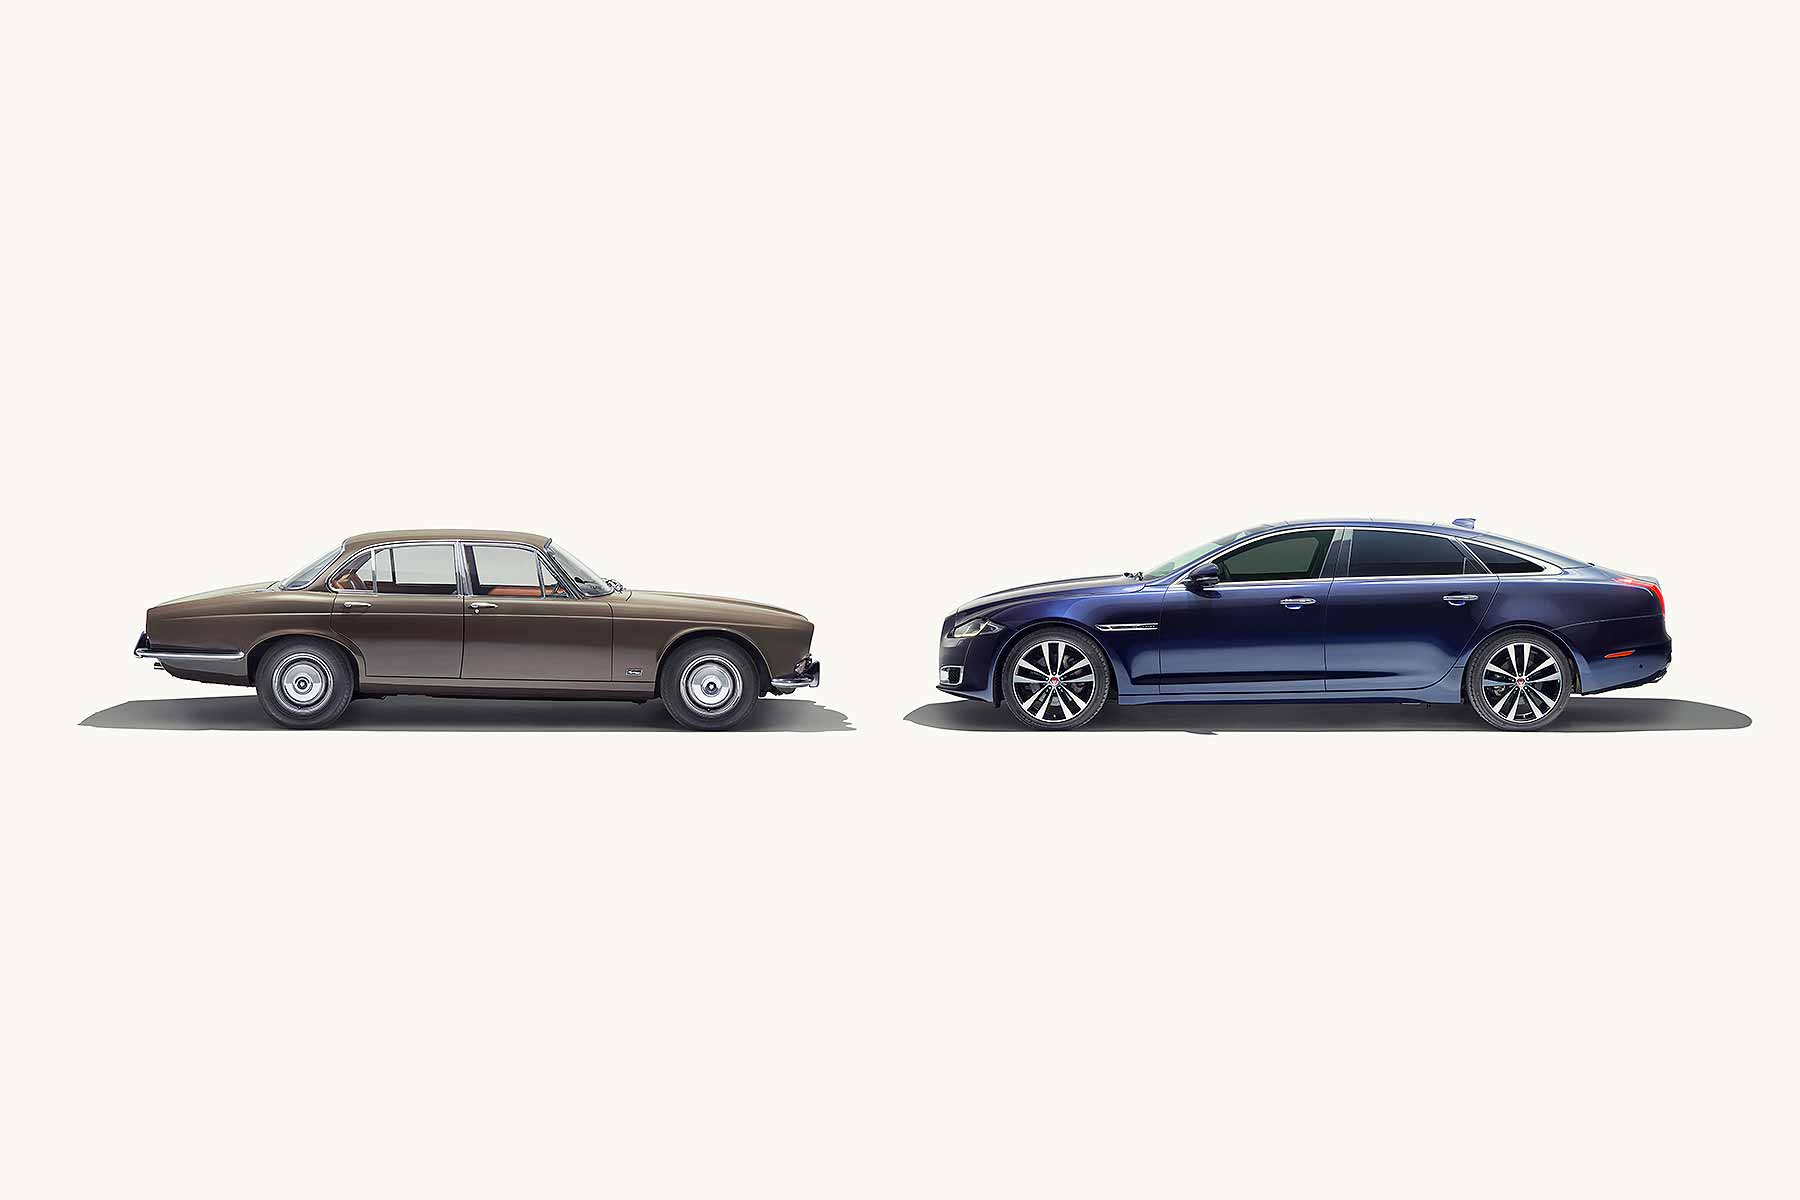 Jaguar XJ 50 years head-to-head